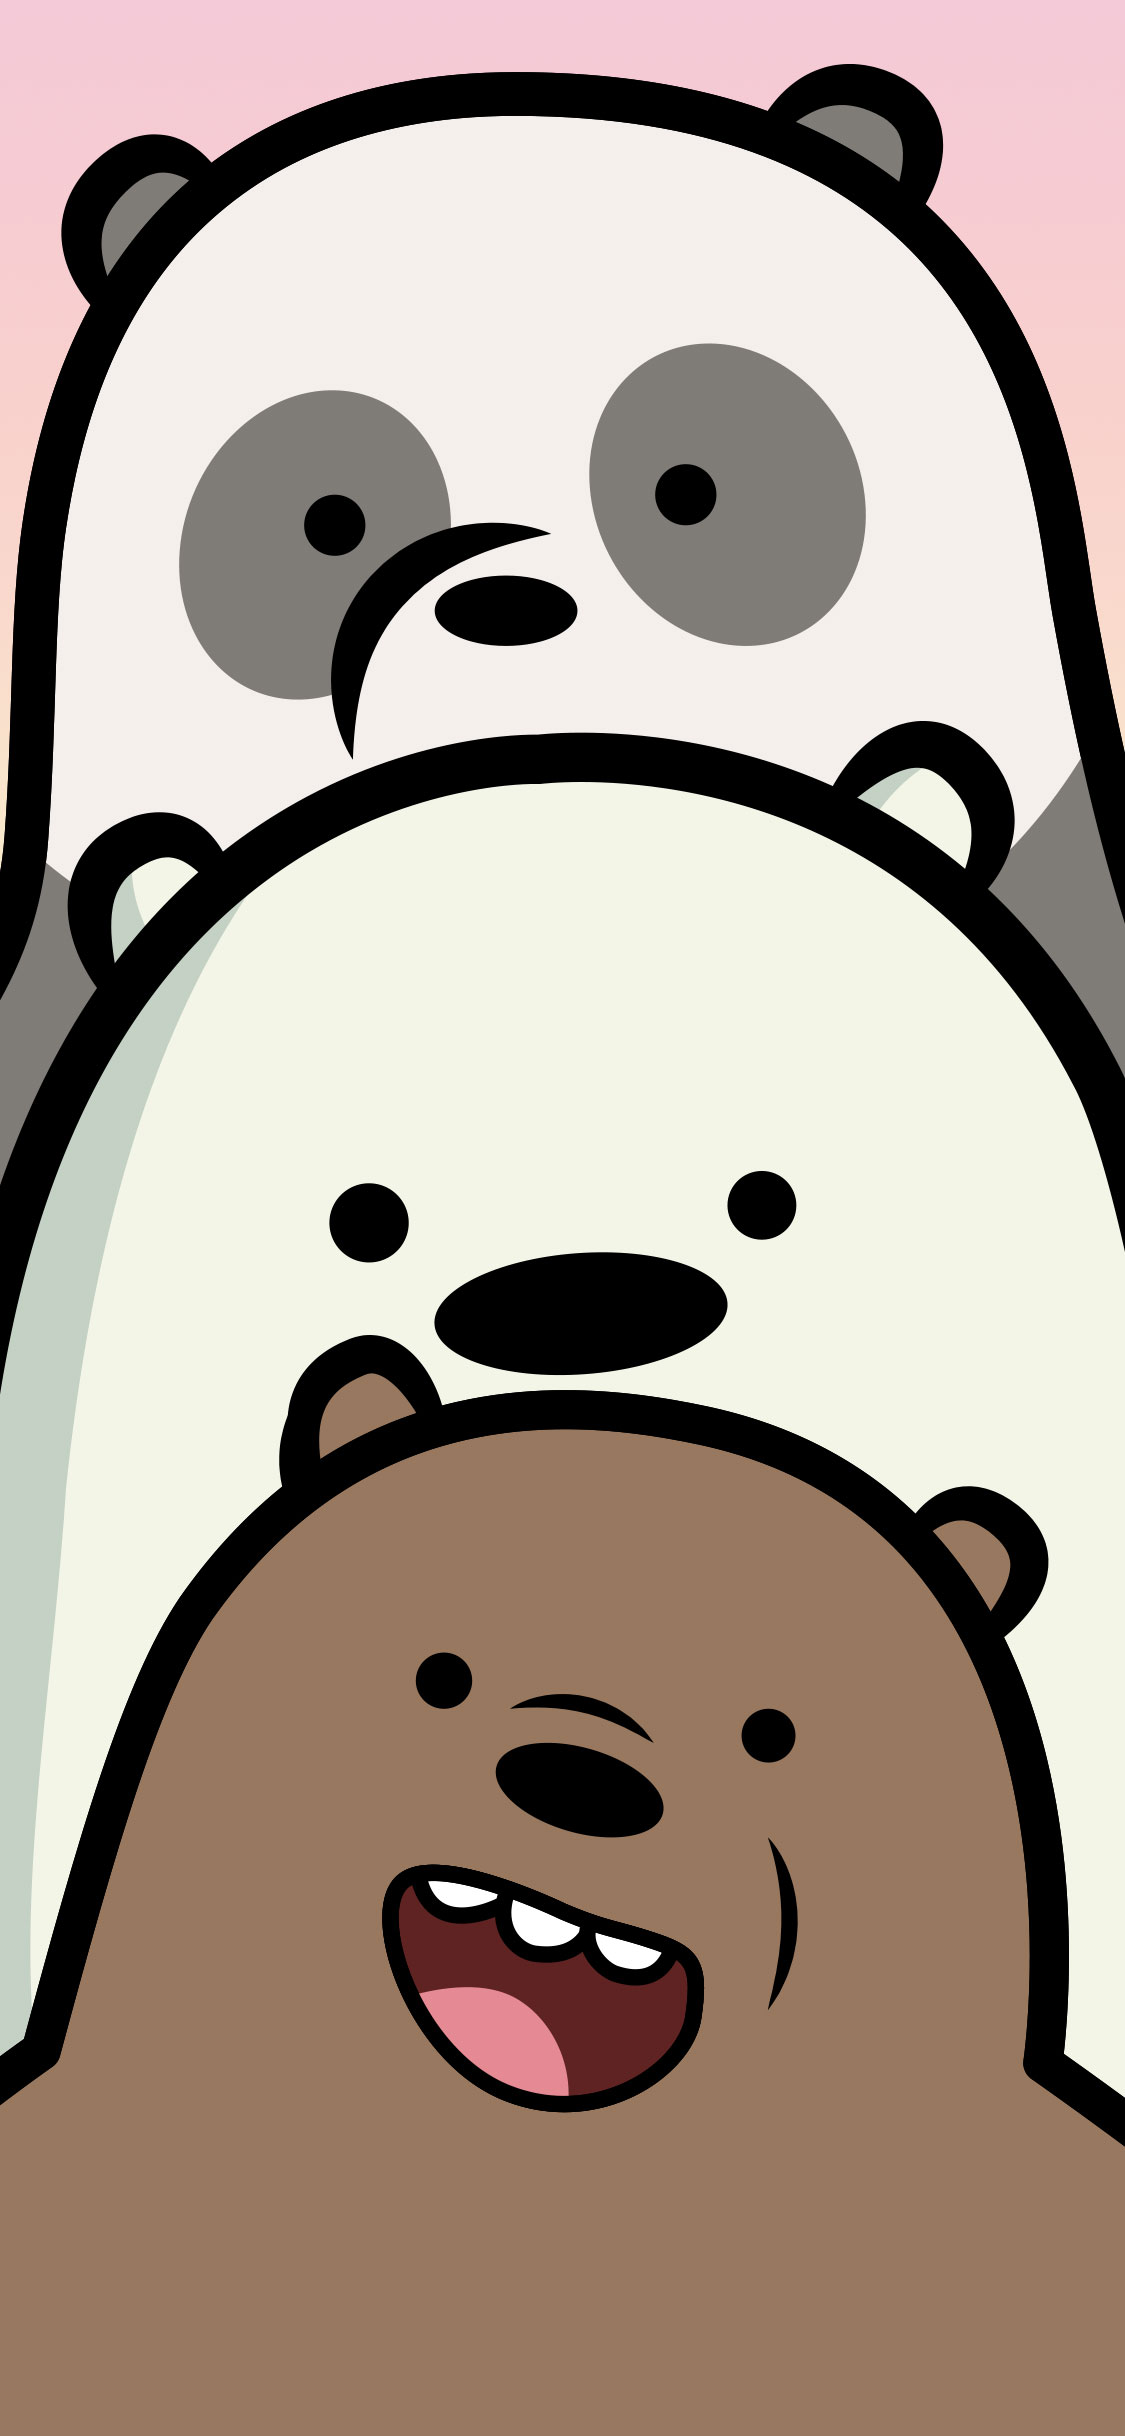 We Bare Bears samsung iphone google pixel Wallpapers 8